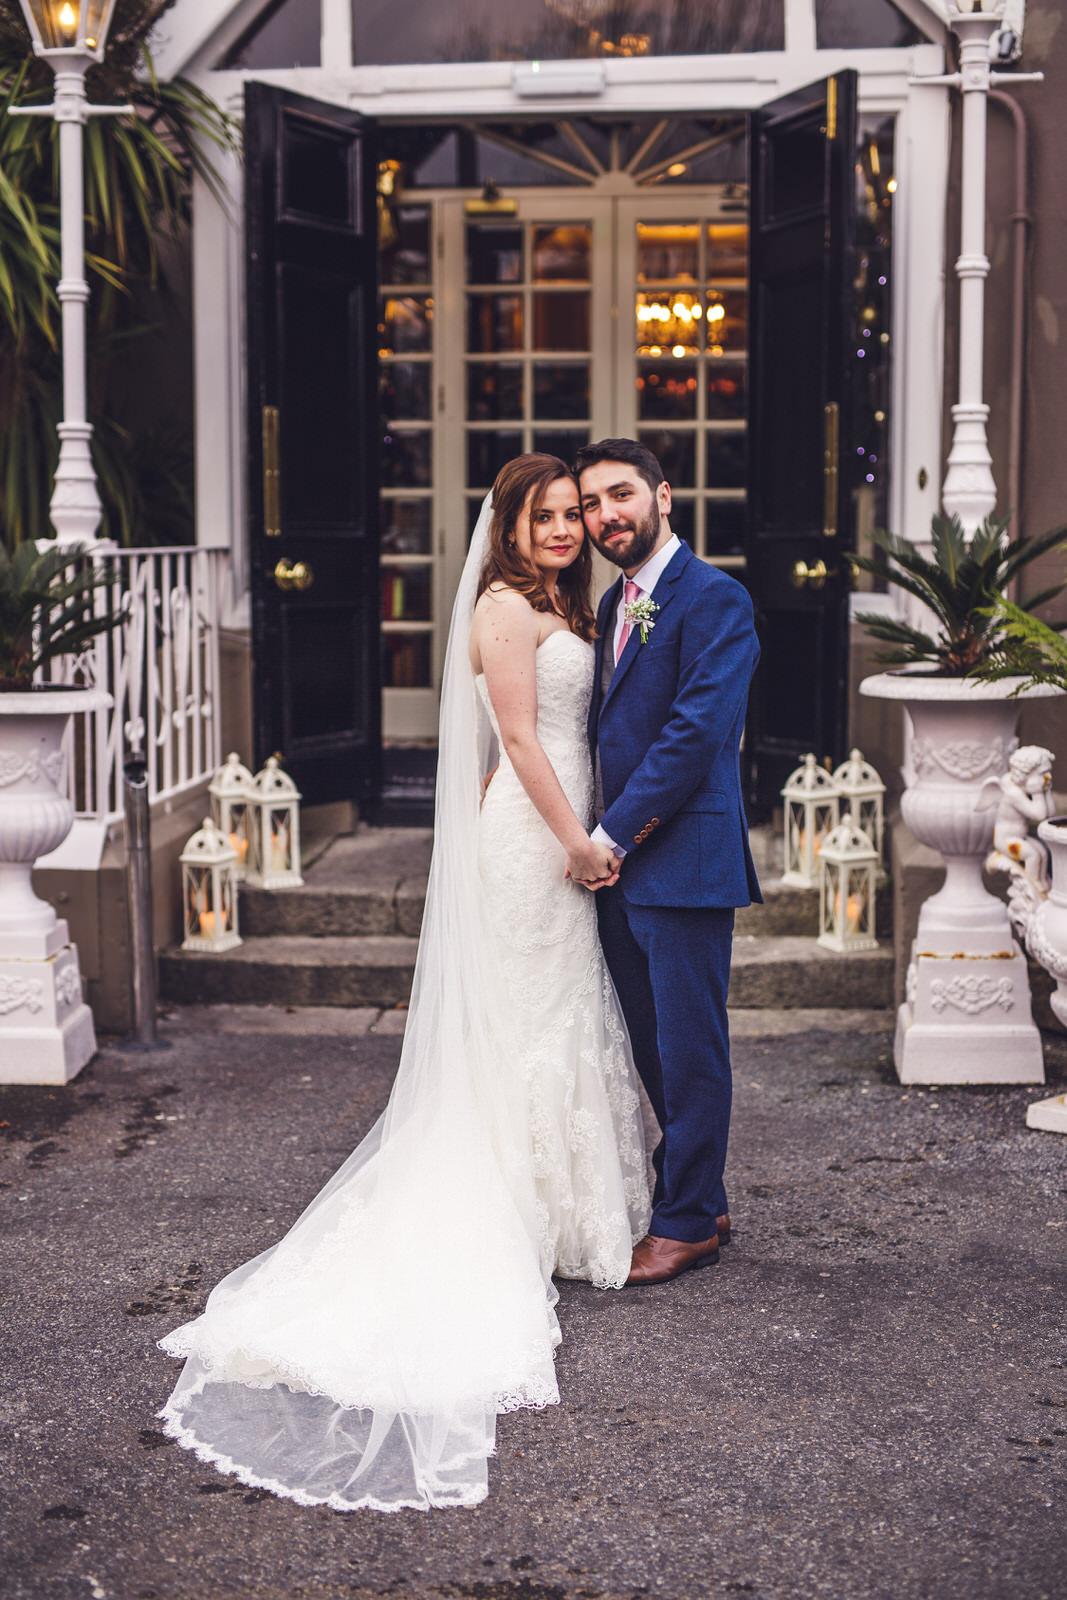 Roger-kenny-wedding-photographer-greystones-wicklow-dublin_072.jpg